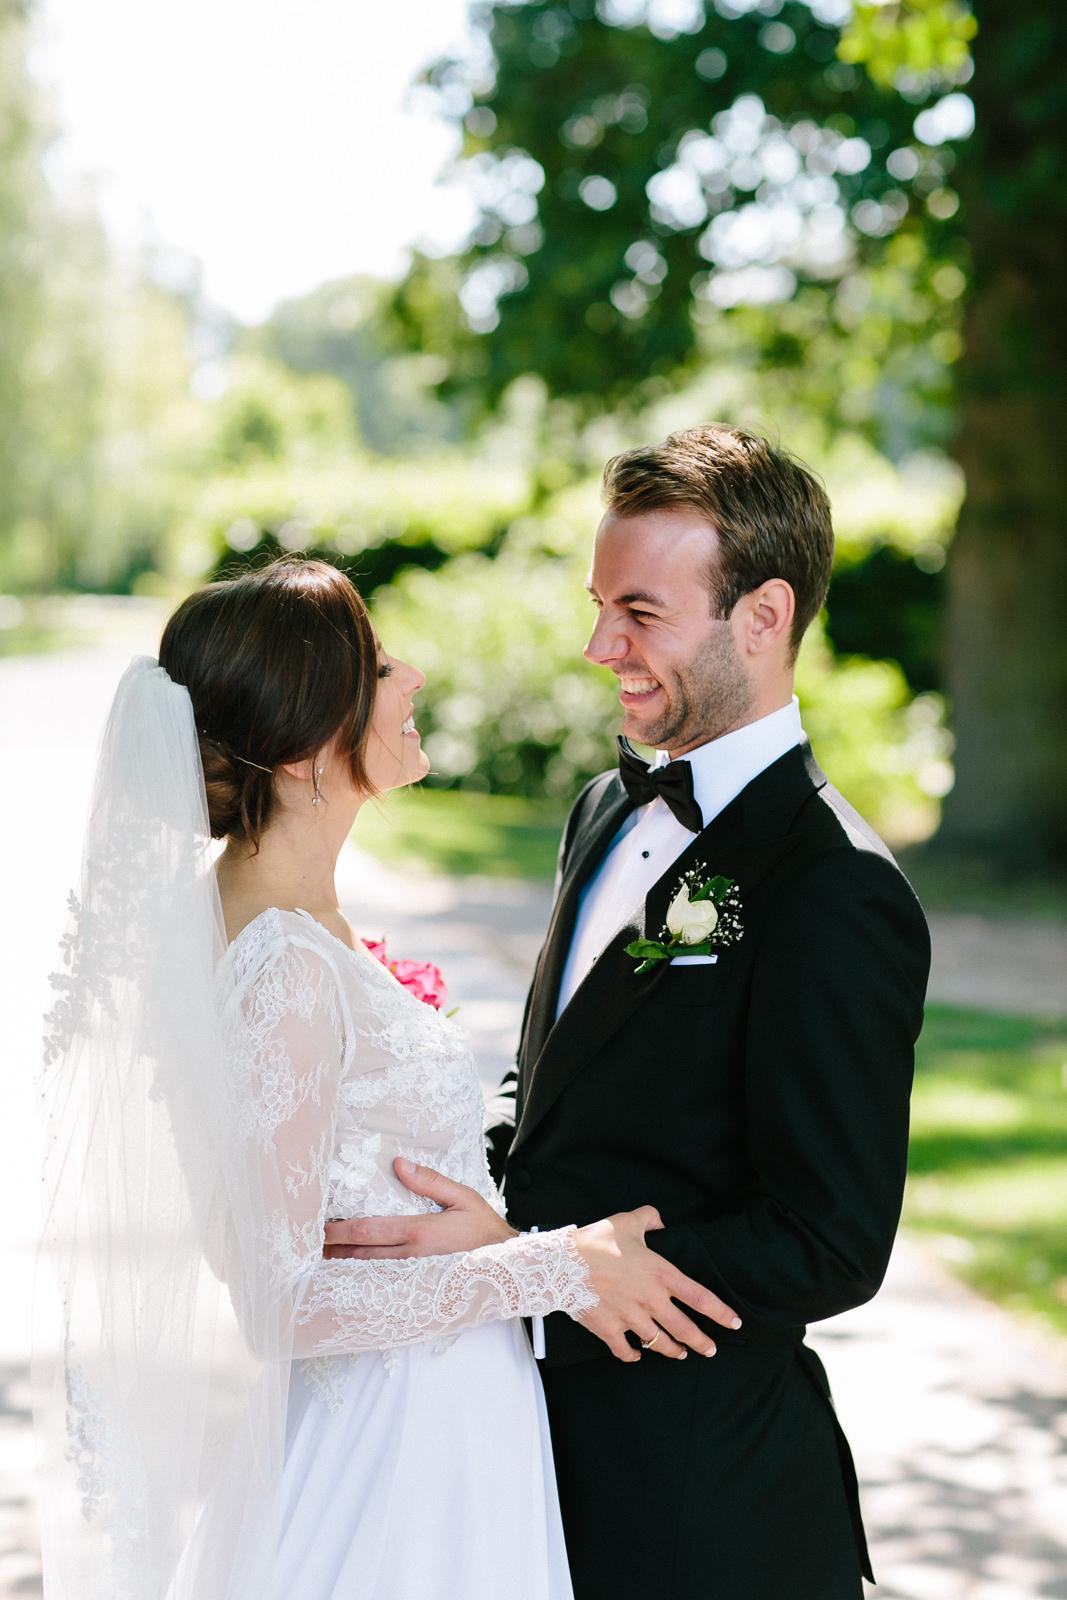 Stanbrooke Abbey Wedding Photographer-319525.jpg